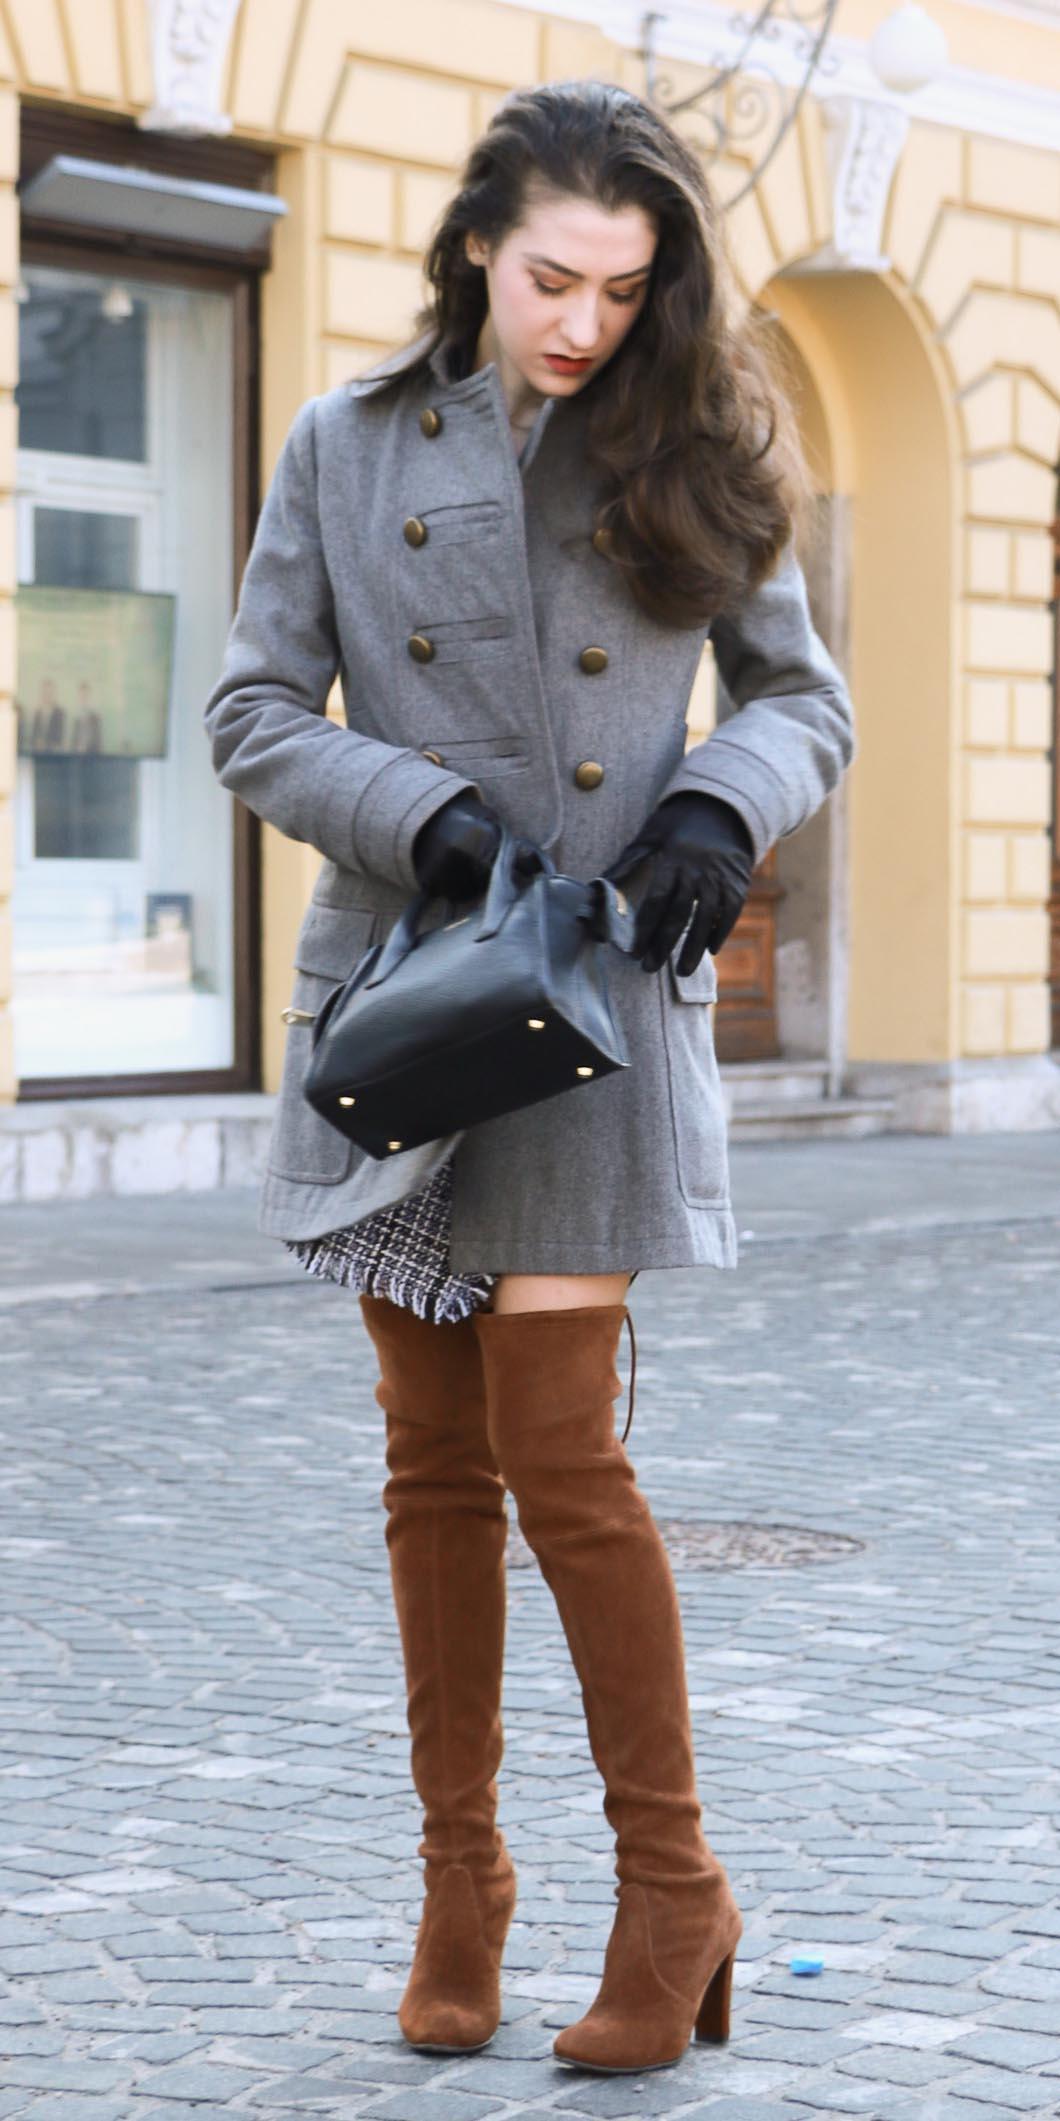 grayl-mini-skirt-grayl-jacket-coat-gloves-black-bag-cognac-shoe-boots-otk-fall-winter-brun-work.jpg